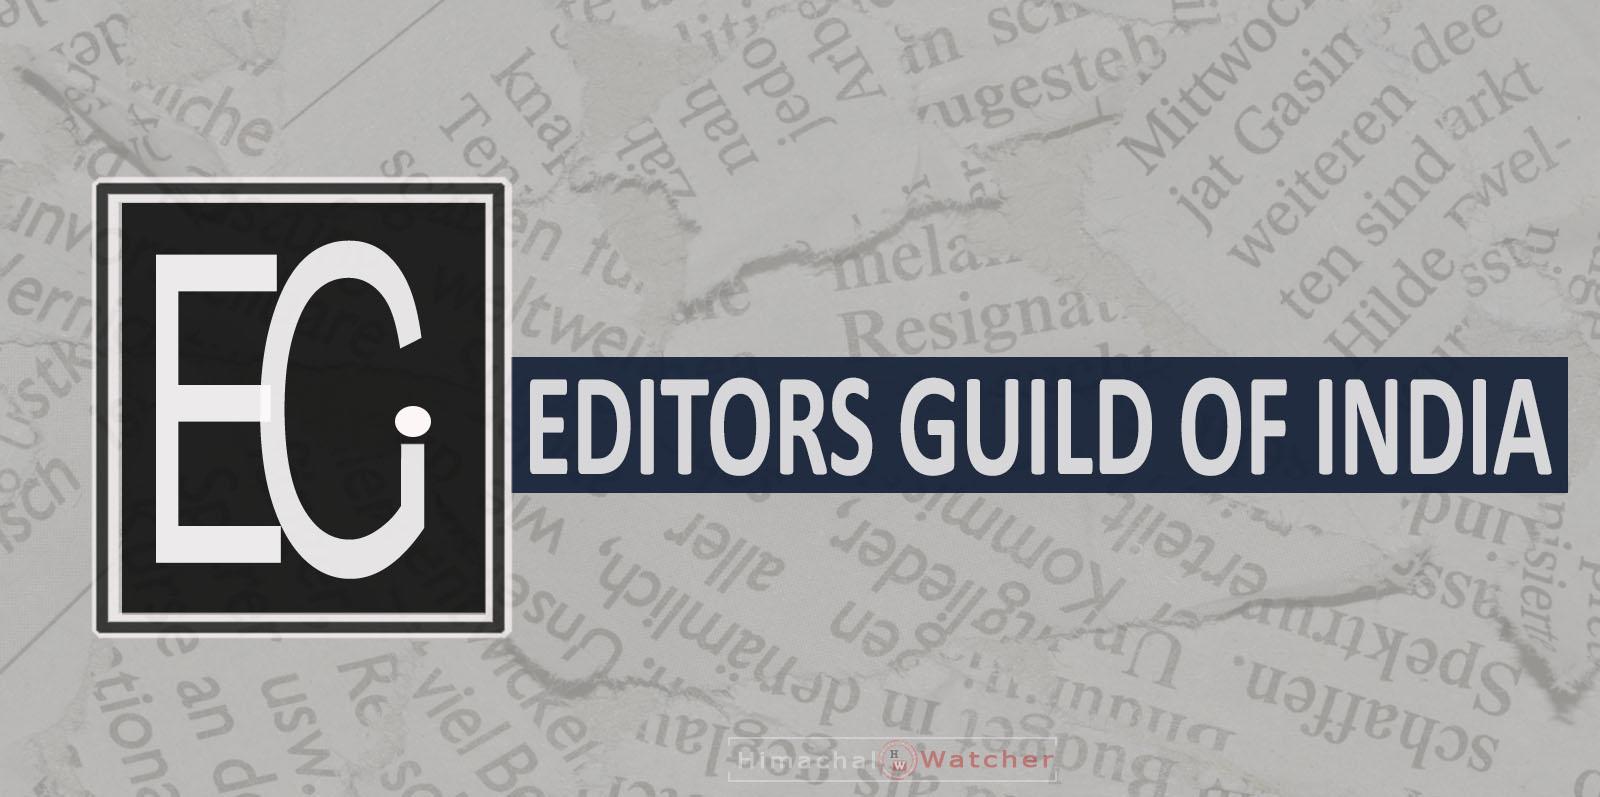 Logo of Editors Guild India